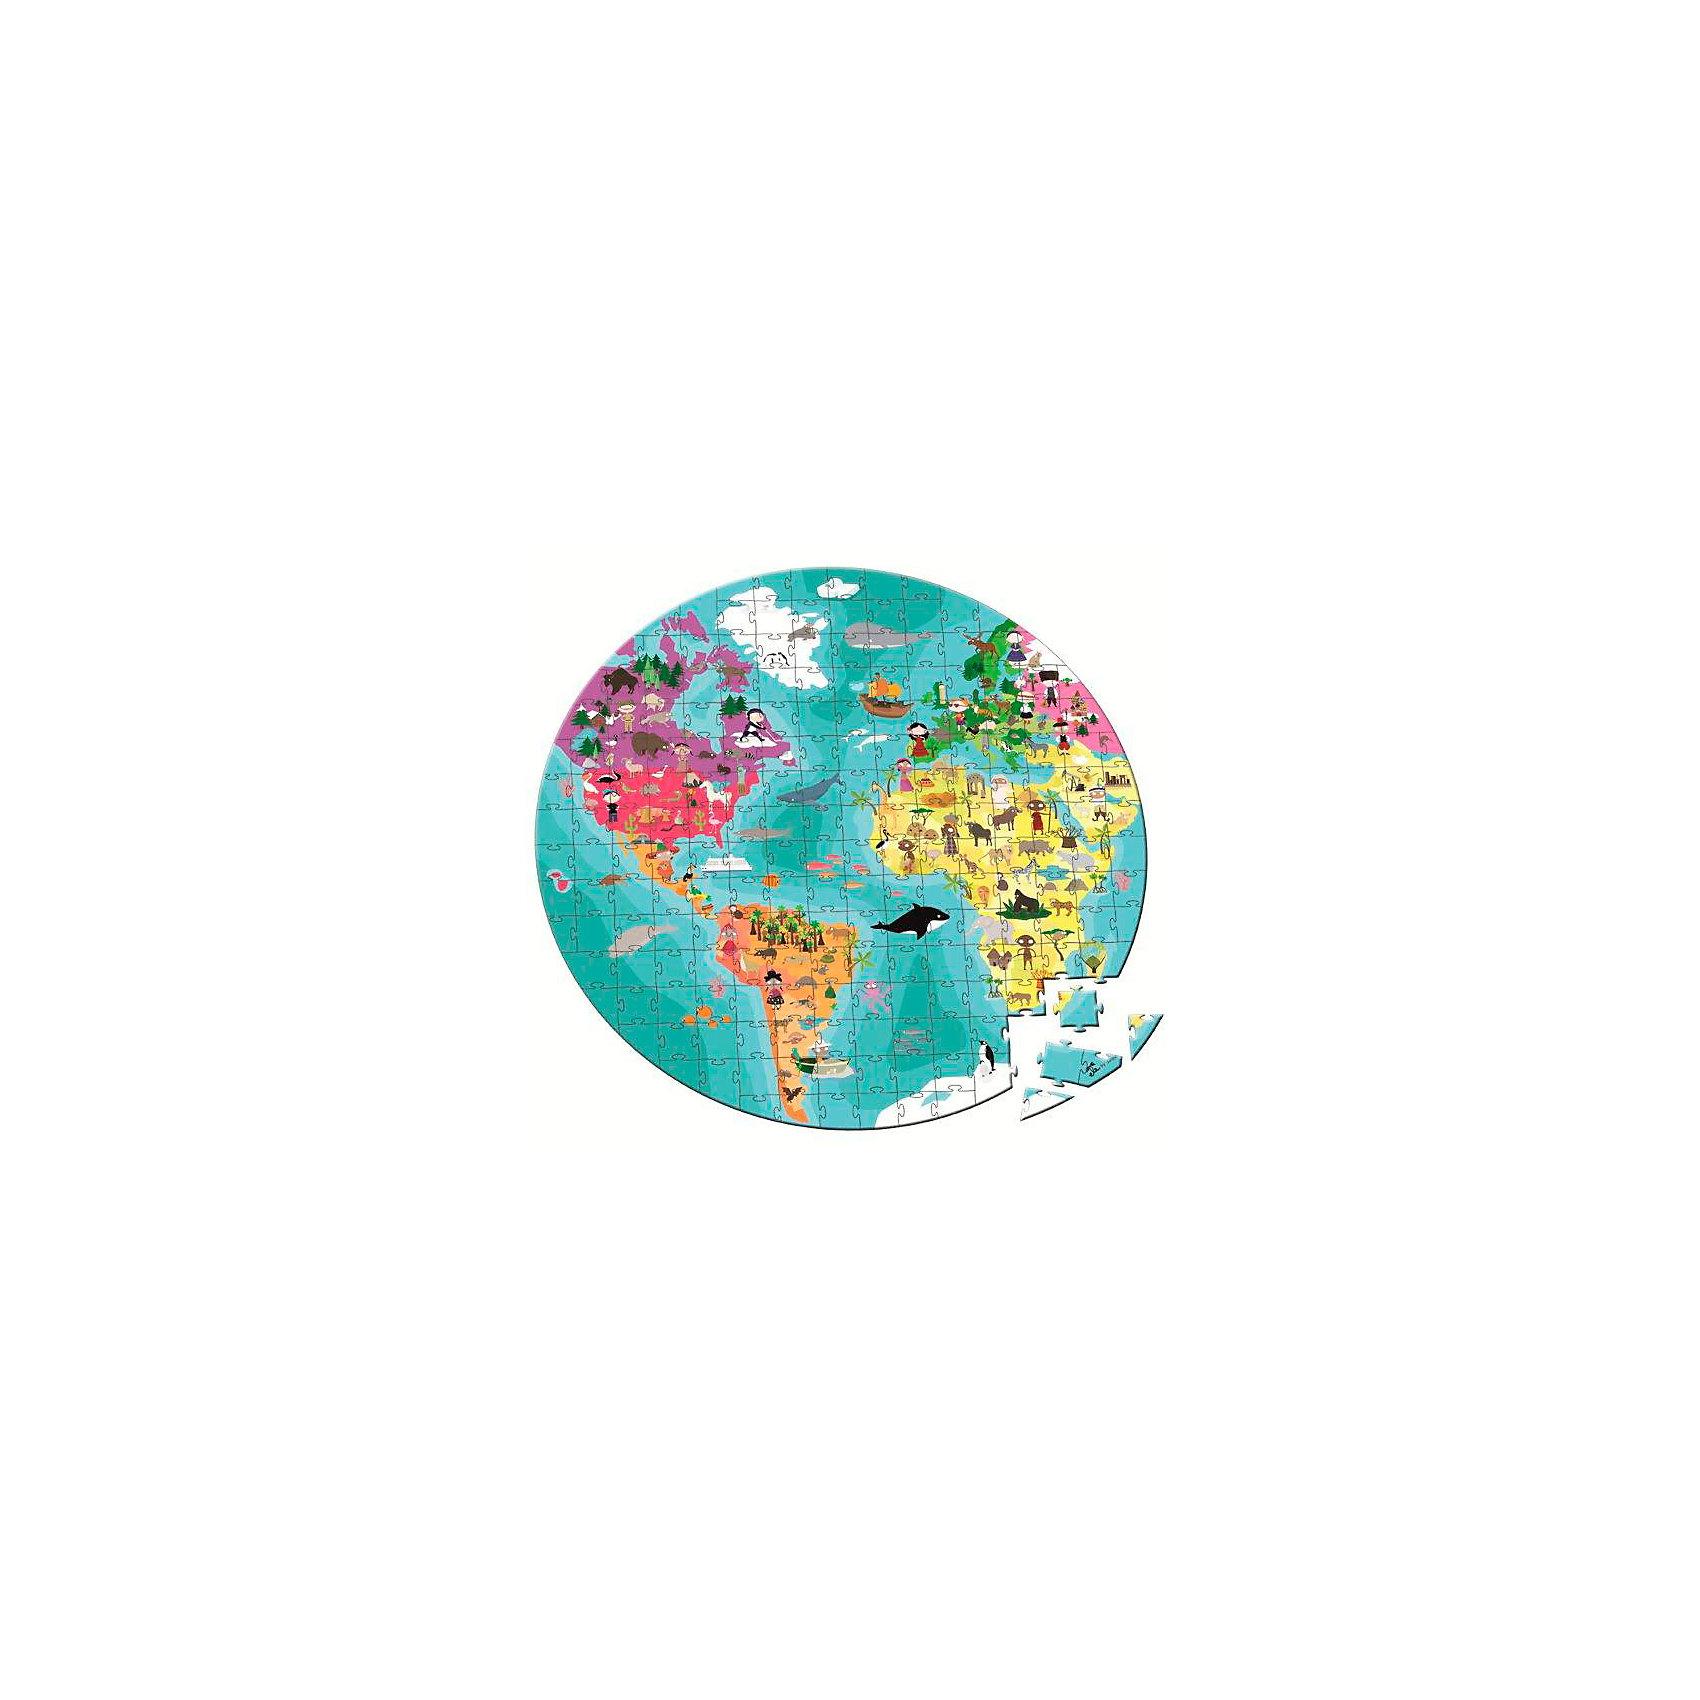 Janod Пазл двухсторонний в круглом чемоданчике Наша планета, 208 деталей, Janod janod пазл я мама 4 в 1